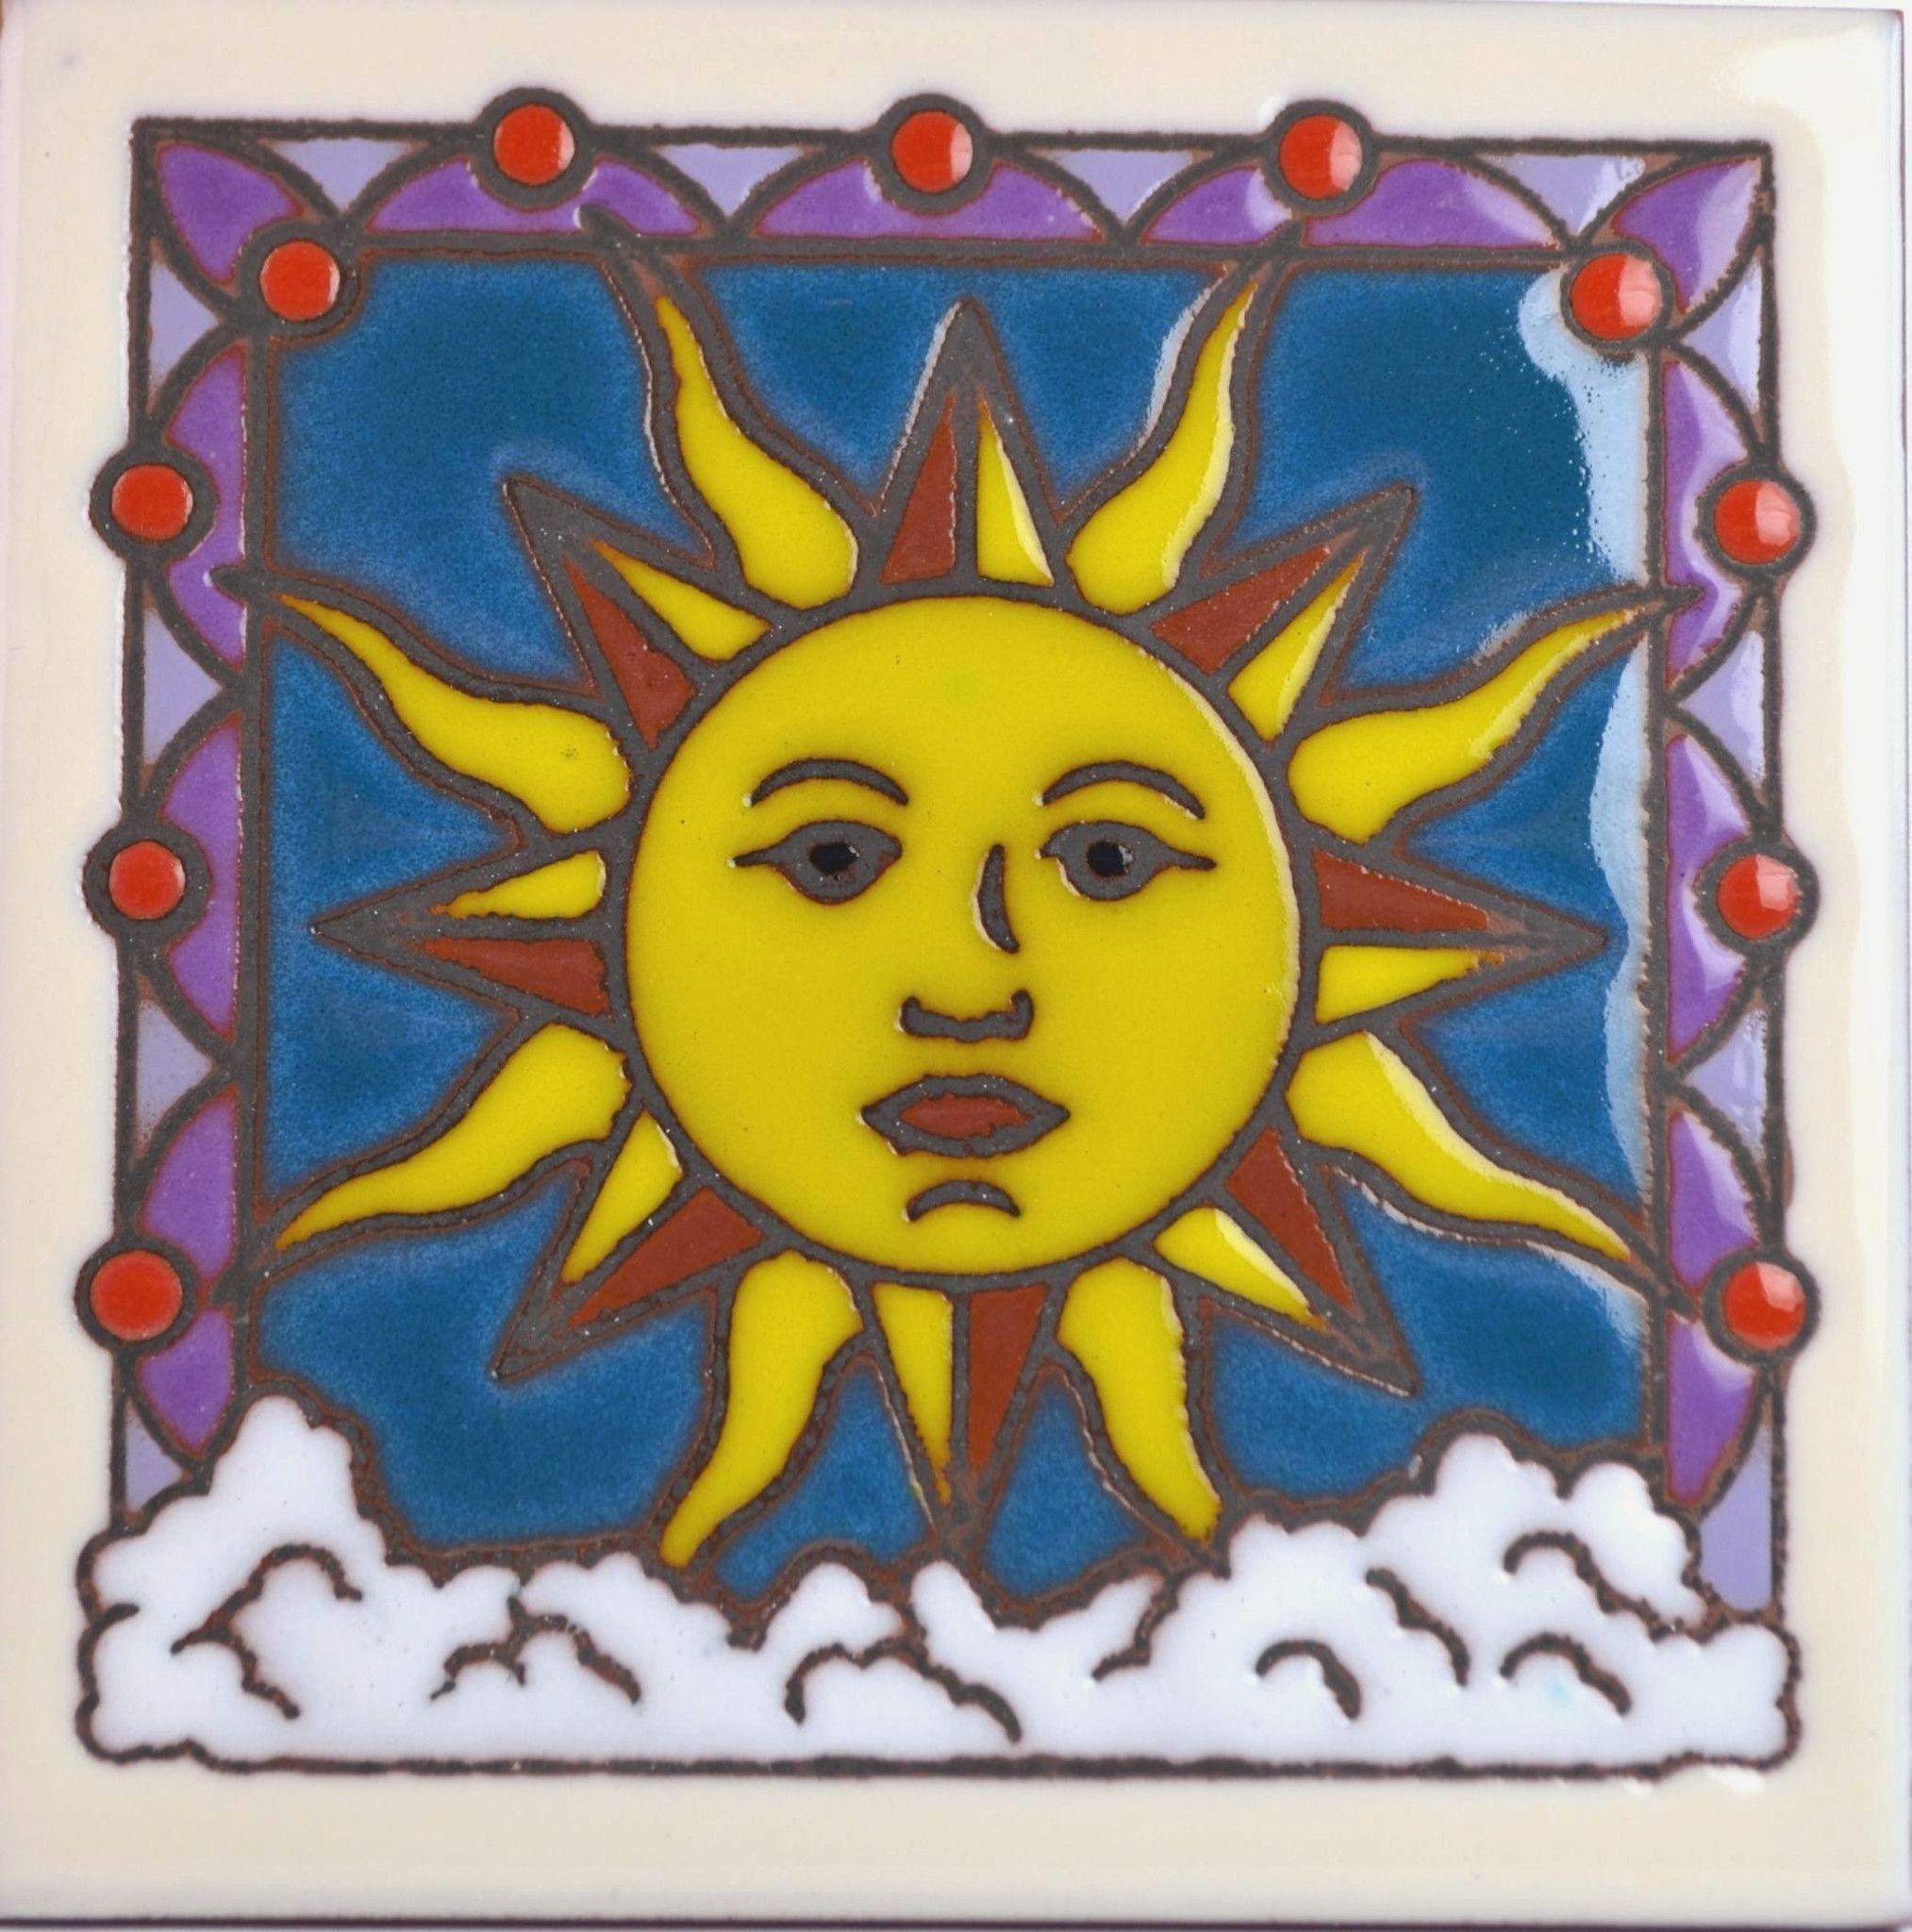 Masterworks Handcrafted Art Tiles - Celestial Sun | Art tiles and ...